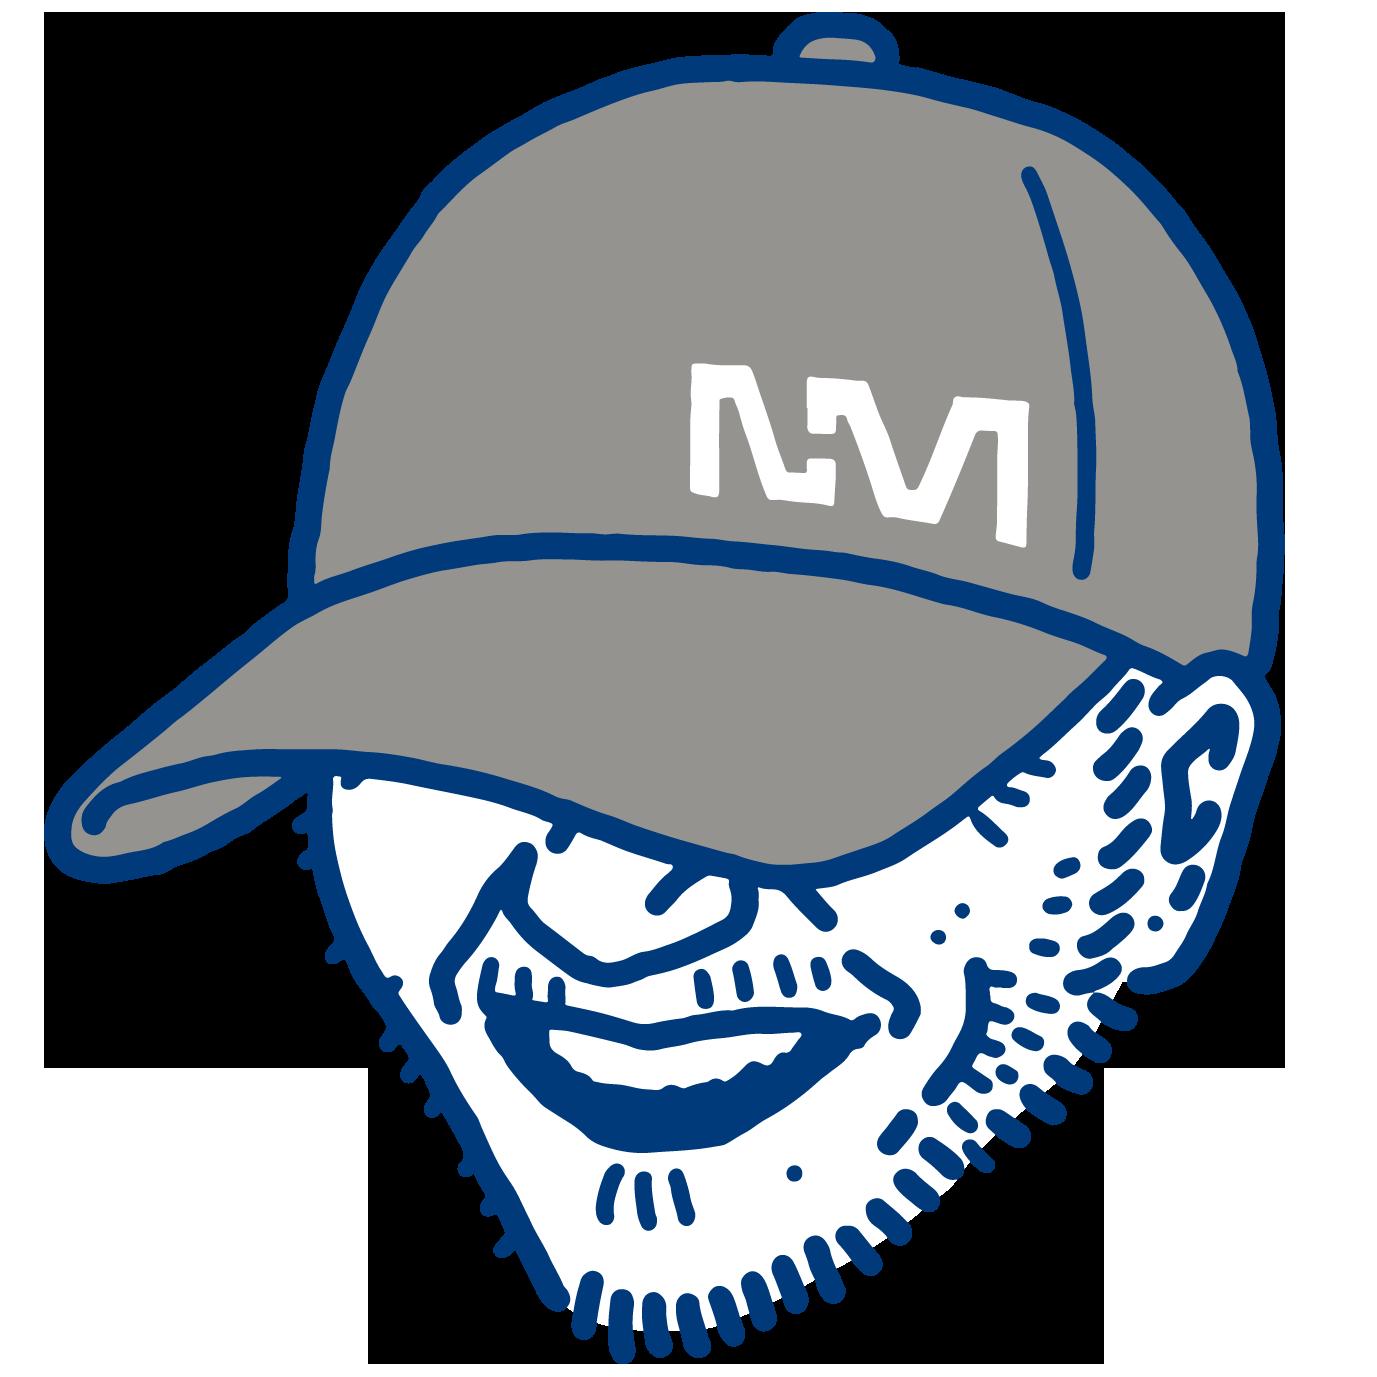 NM_Avatar_v1.png